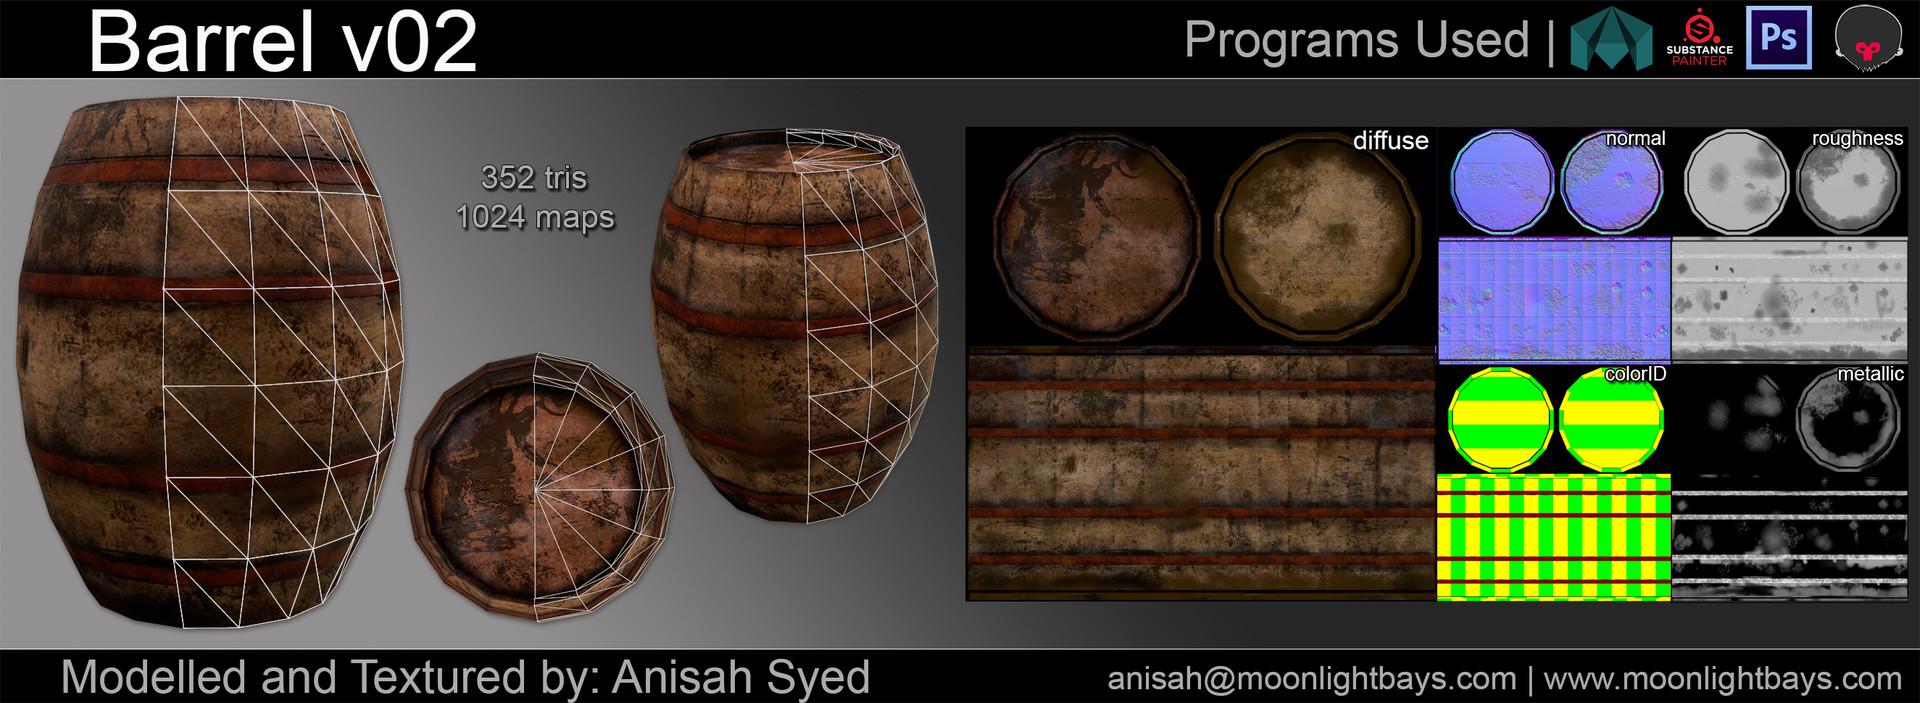 Anisah syed barrel02presentation